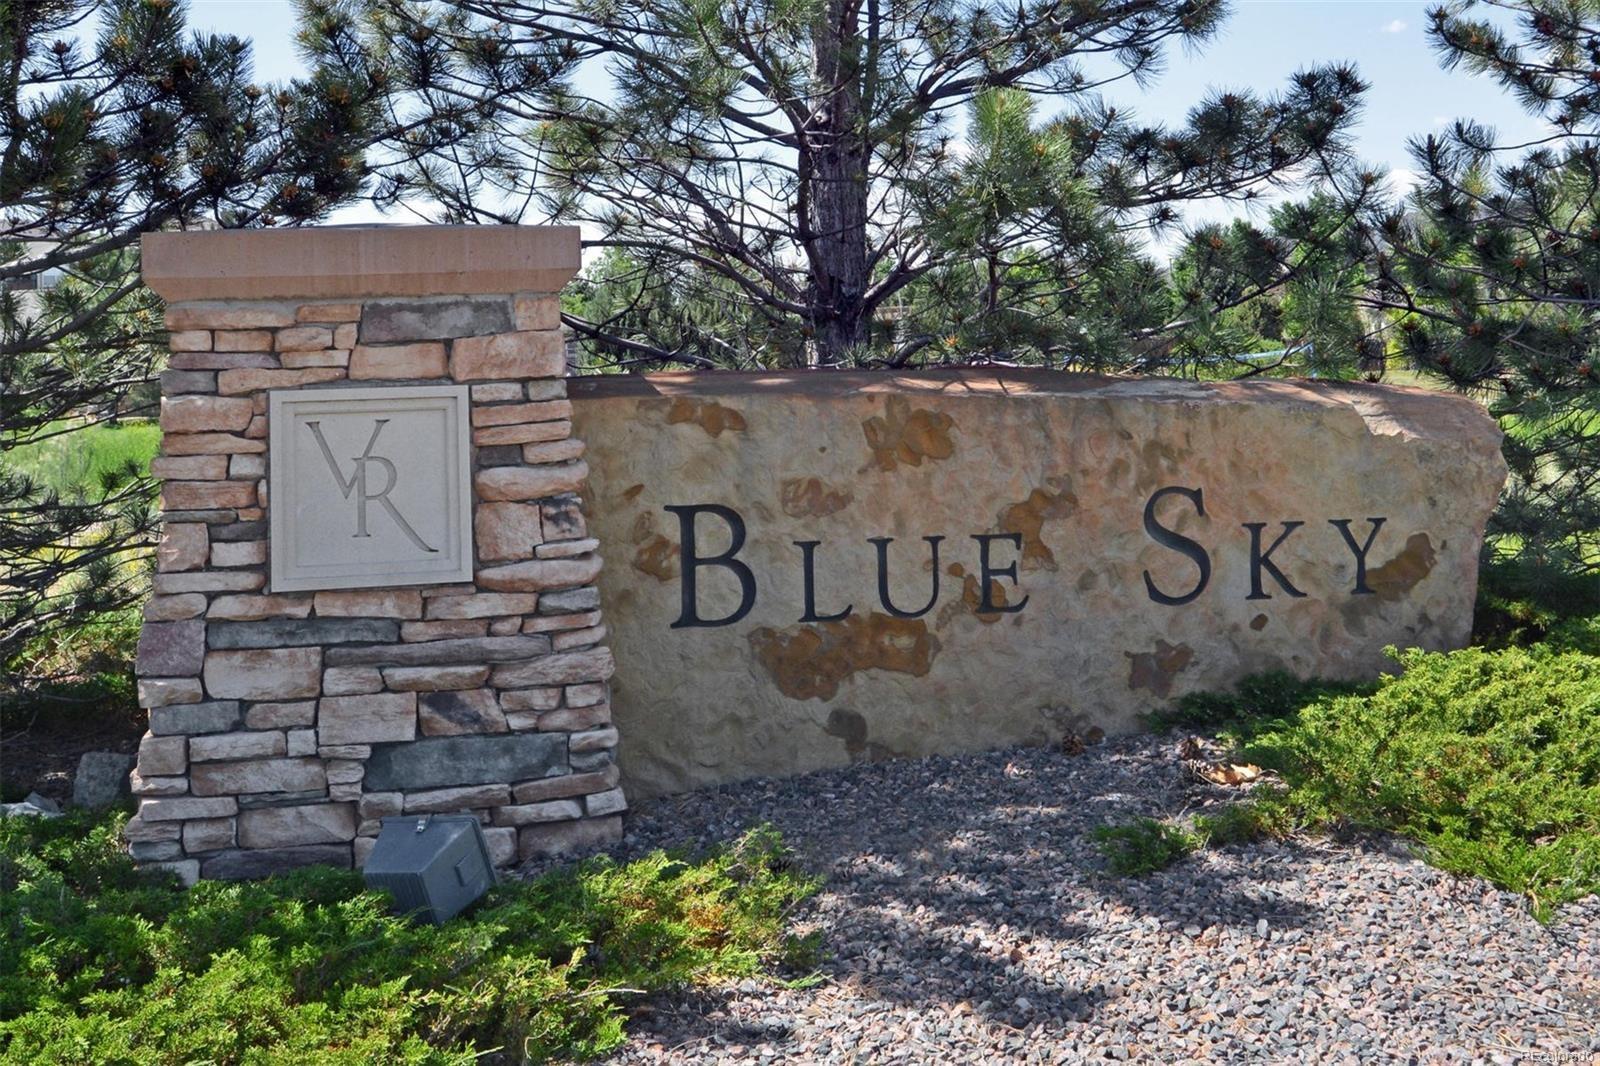 MLS# 7280446 - 1 - 2875  Blue Sky Circle, Erie, CO 80516